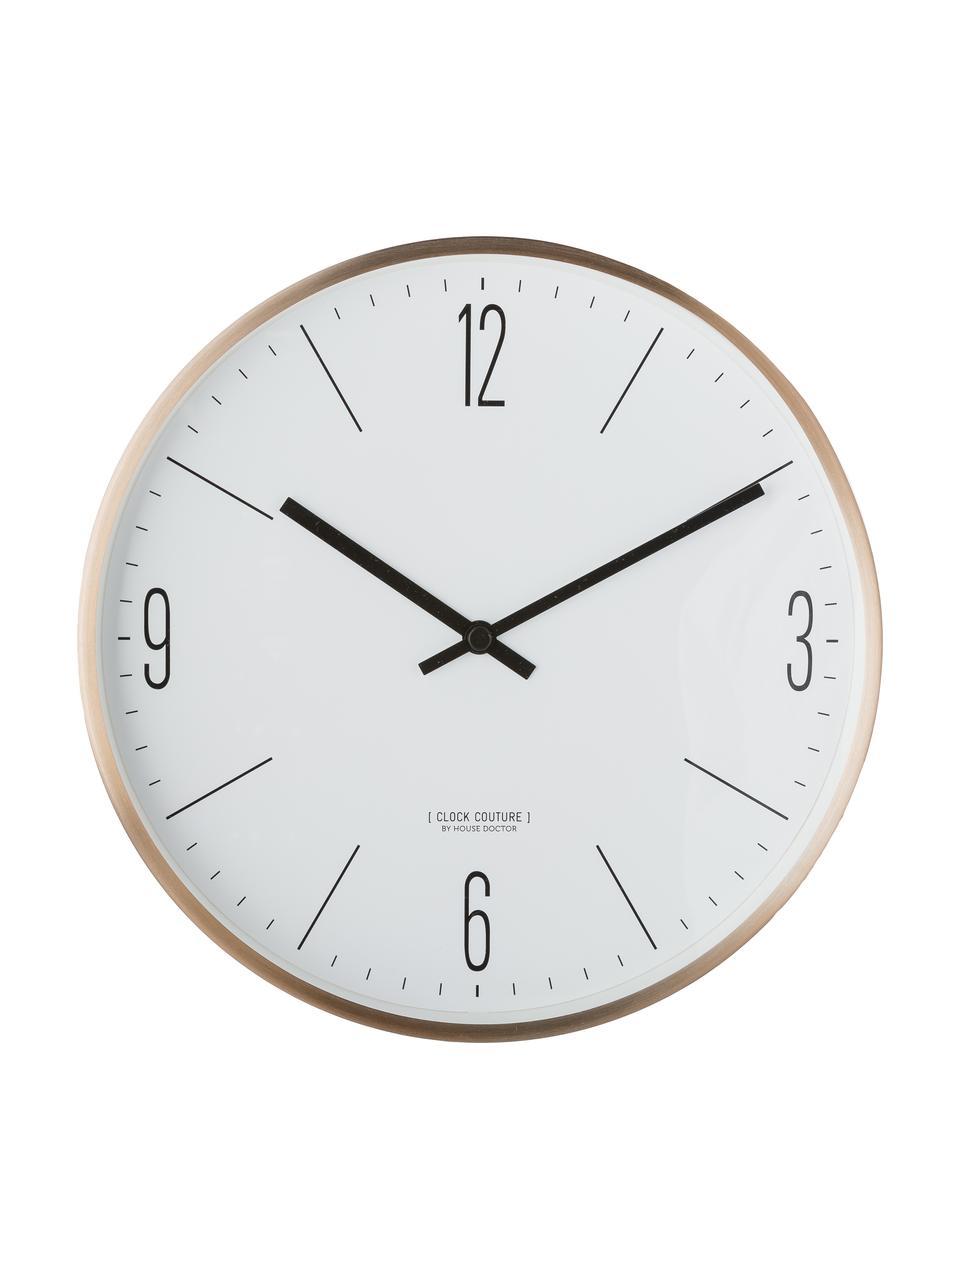 Wanduhr Couture, Aluminium, Gold,Weiß, Ø 30 cm